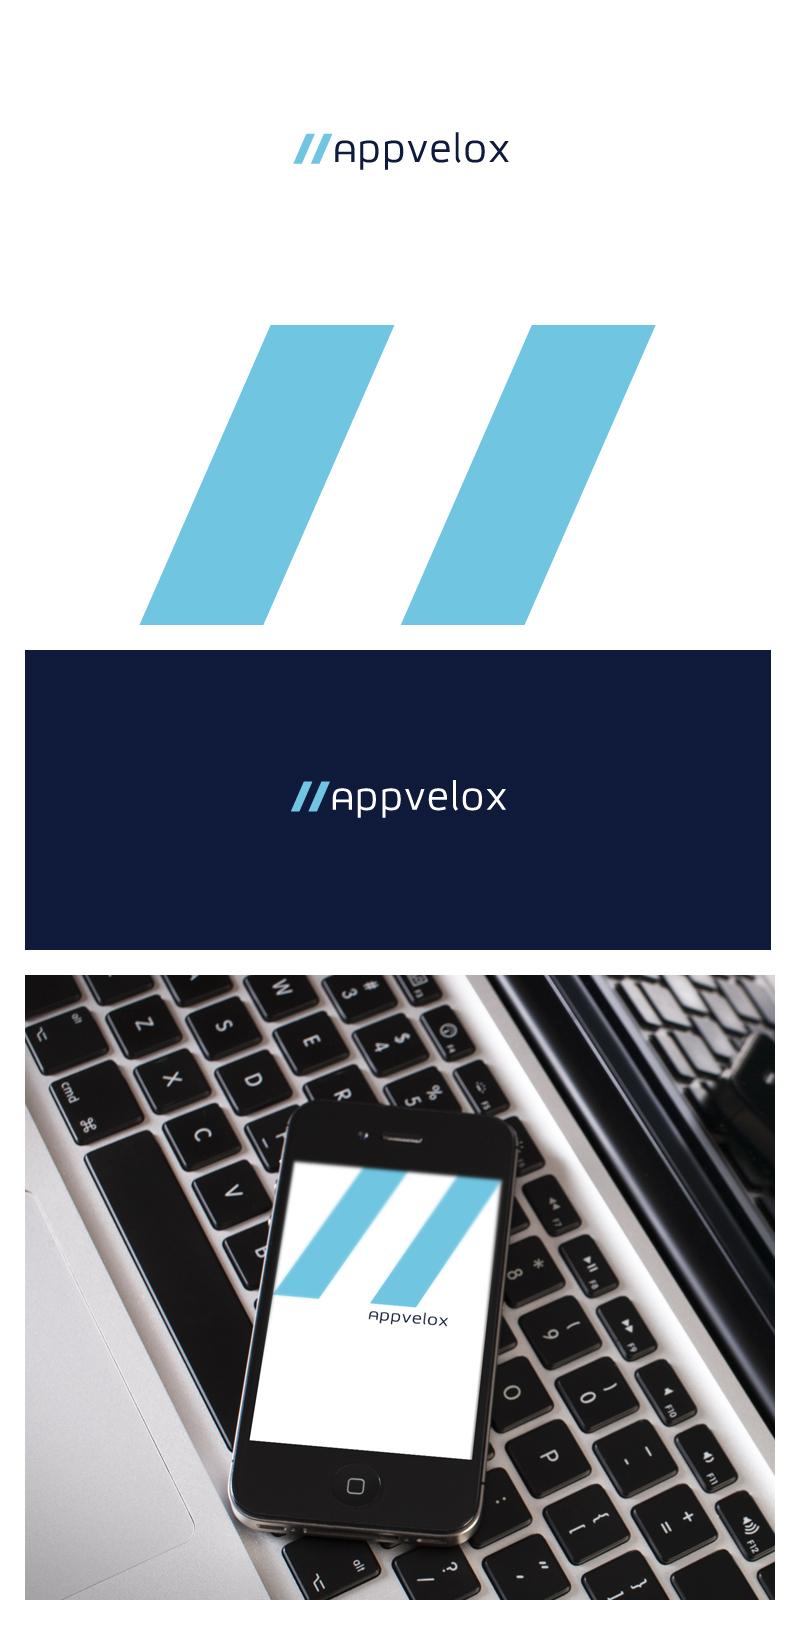 Appvelox